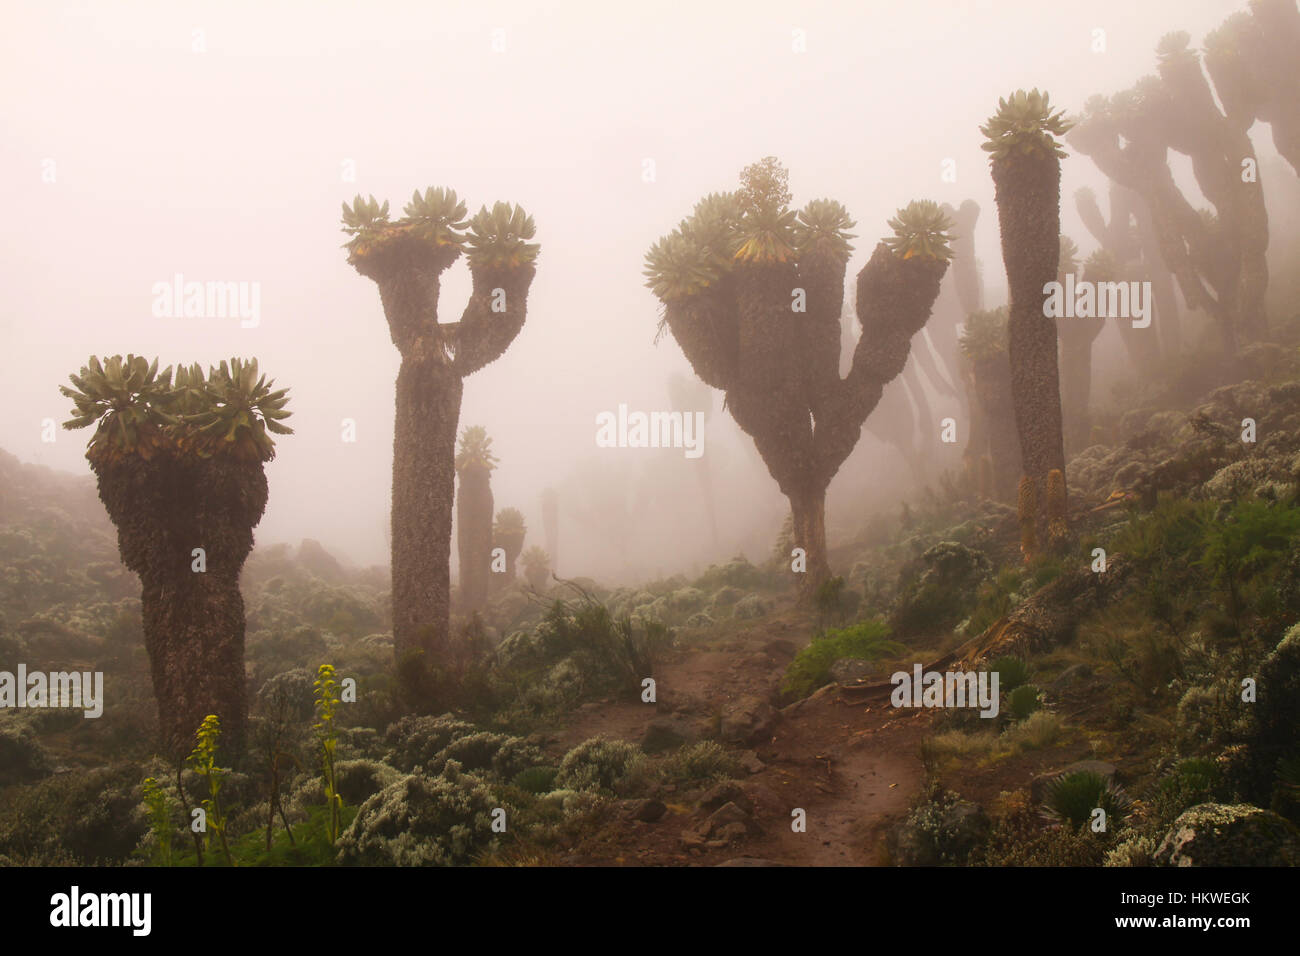 Senecios: Giant Groundsels in Mt. Kilimanjaro mist - Stock Image